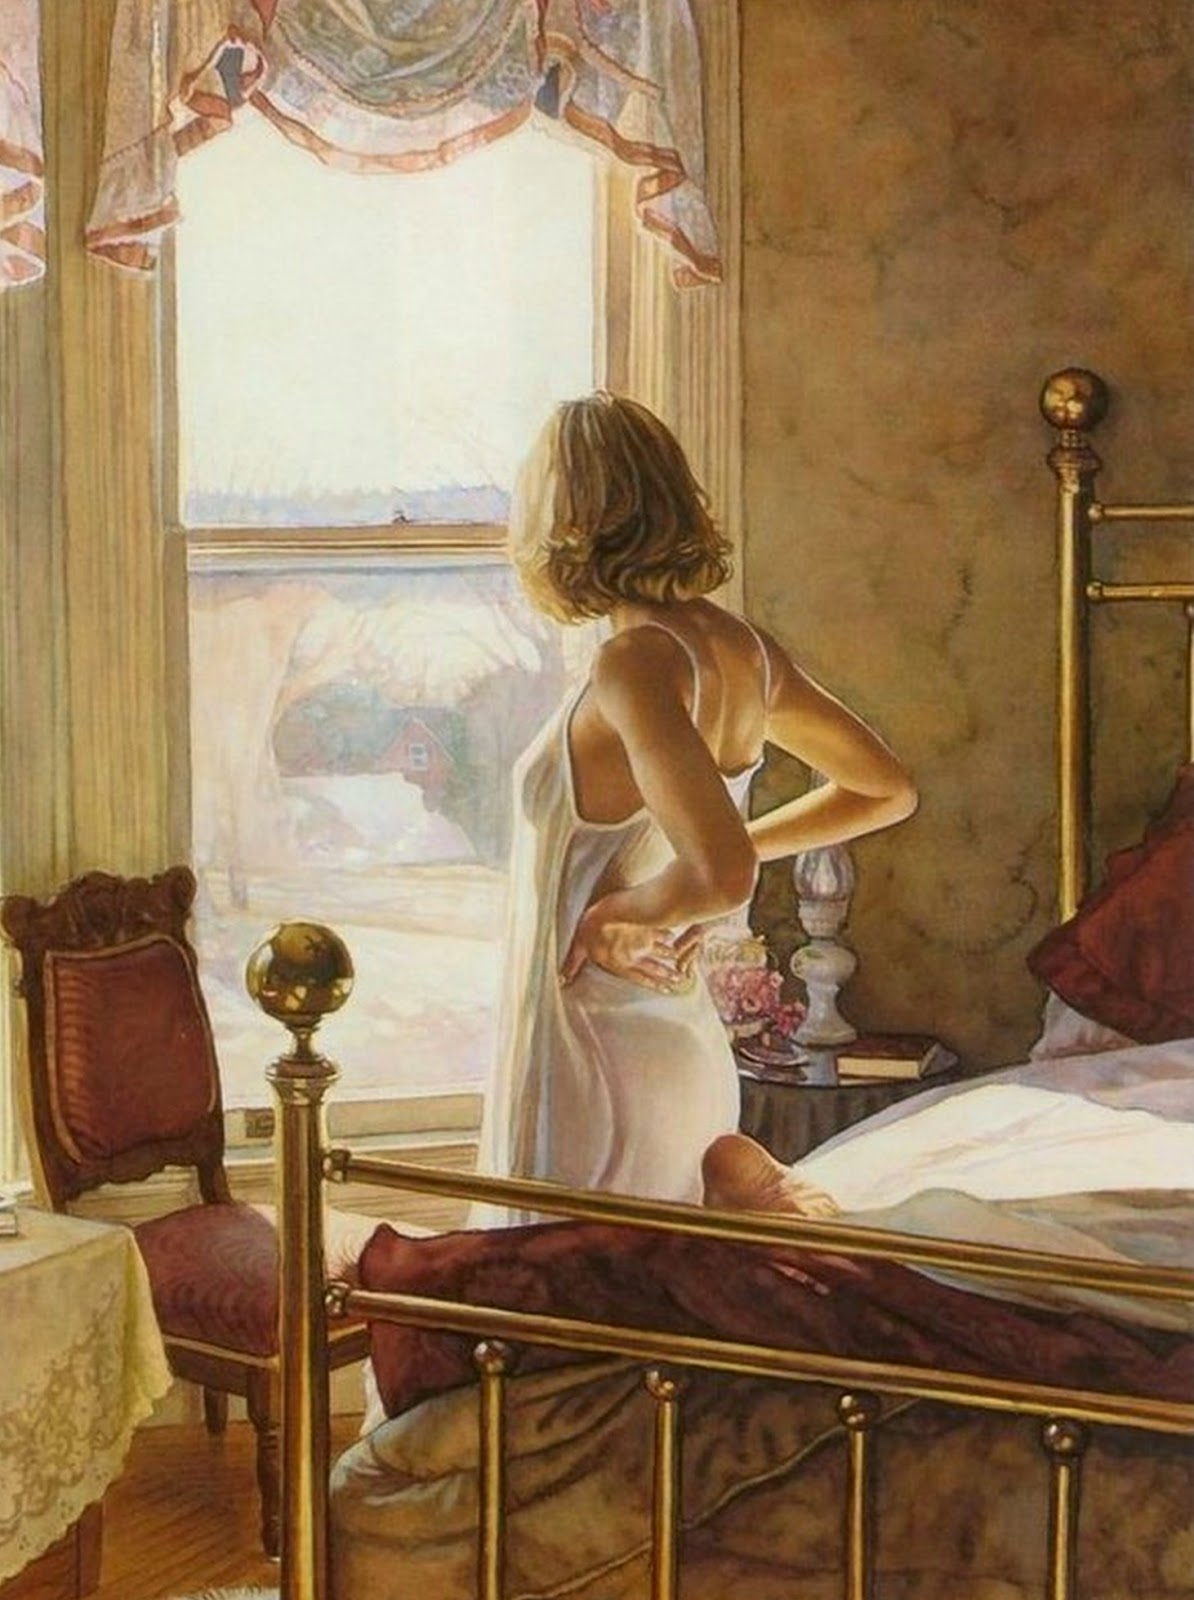 arte-realista-femenino-pintado-con-acuarela